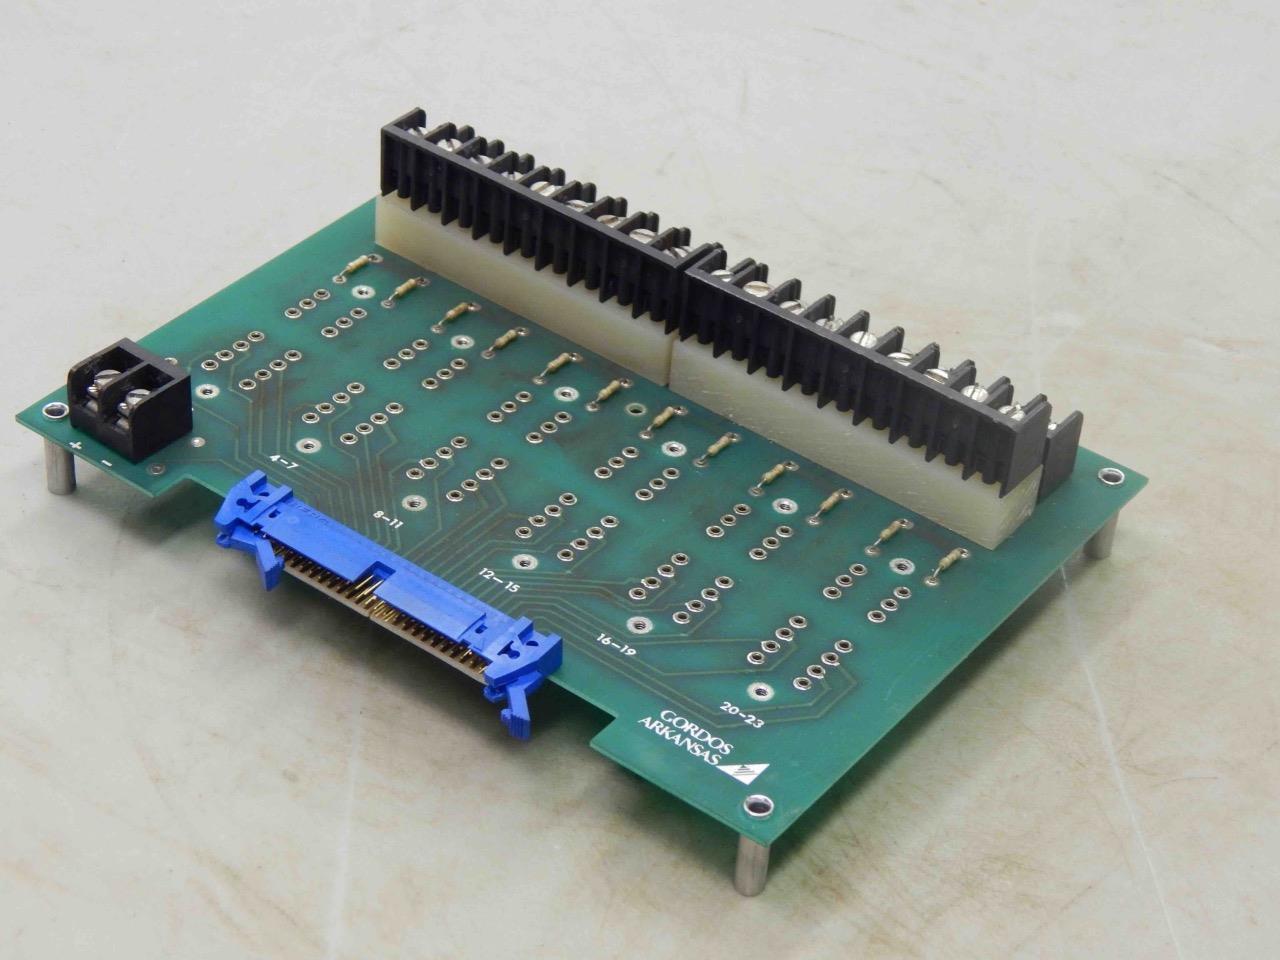 Gordos 57-234B PCB Mounting Circuit Board Module